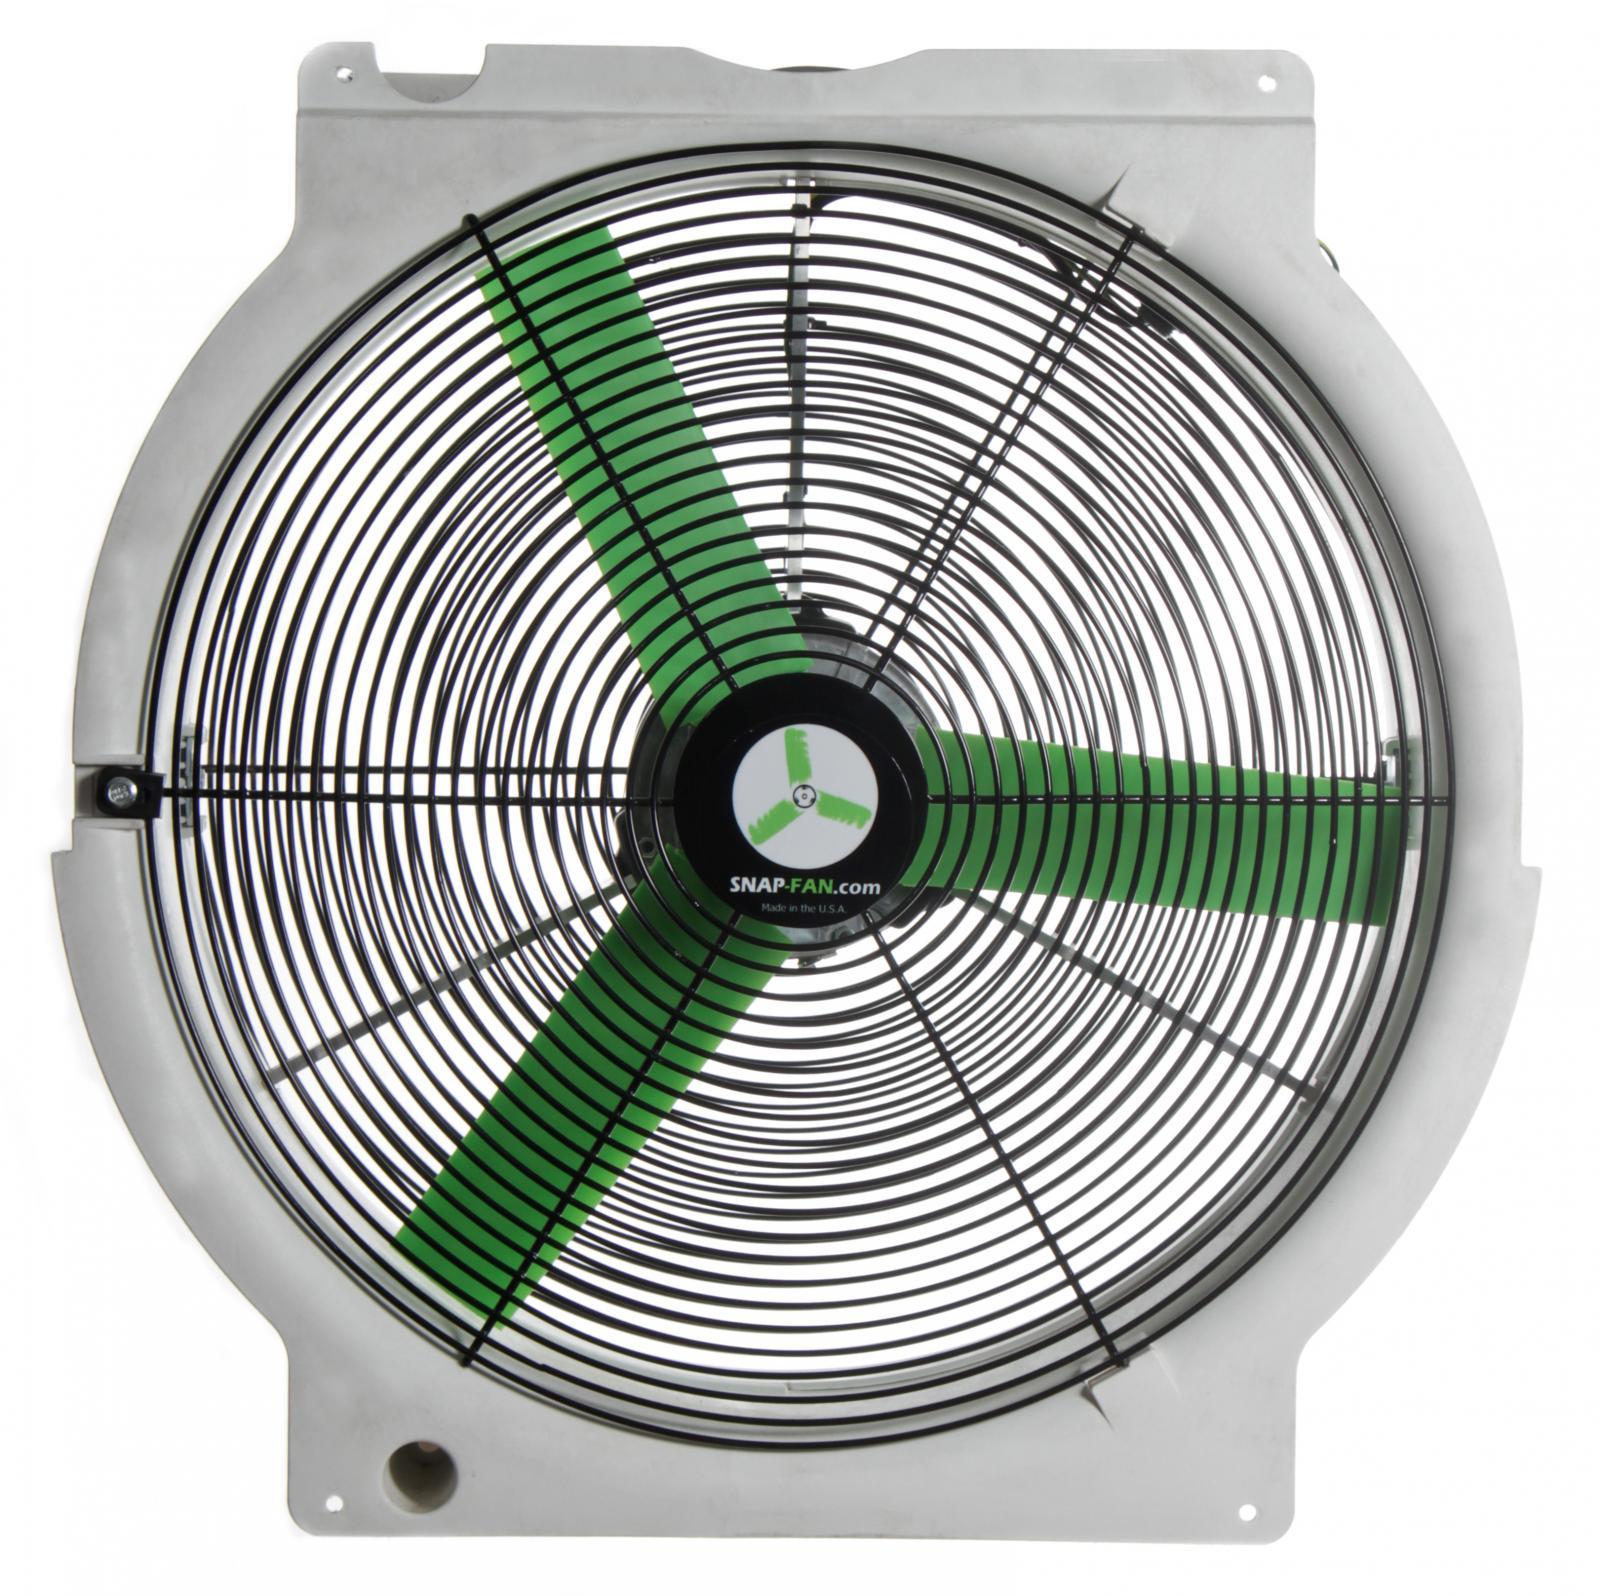 Greenhouse Air Circulation : Quot circulation snap fan solar national air propulsion